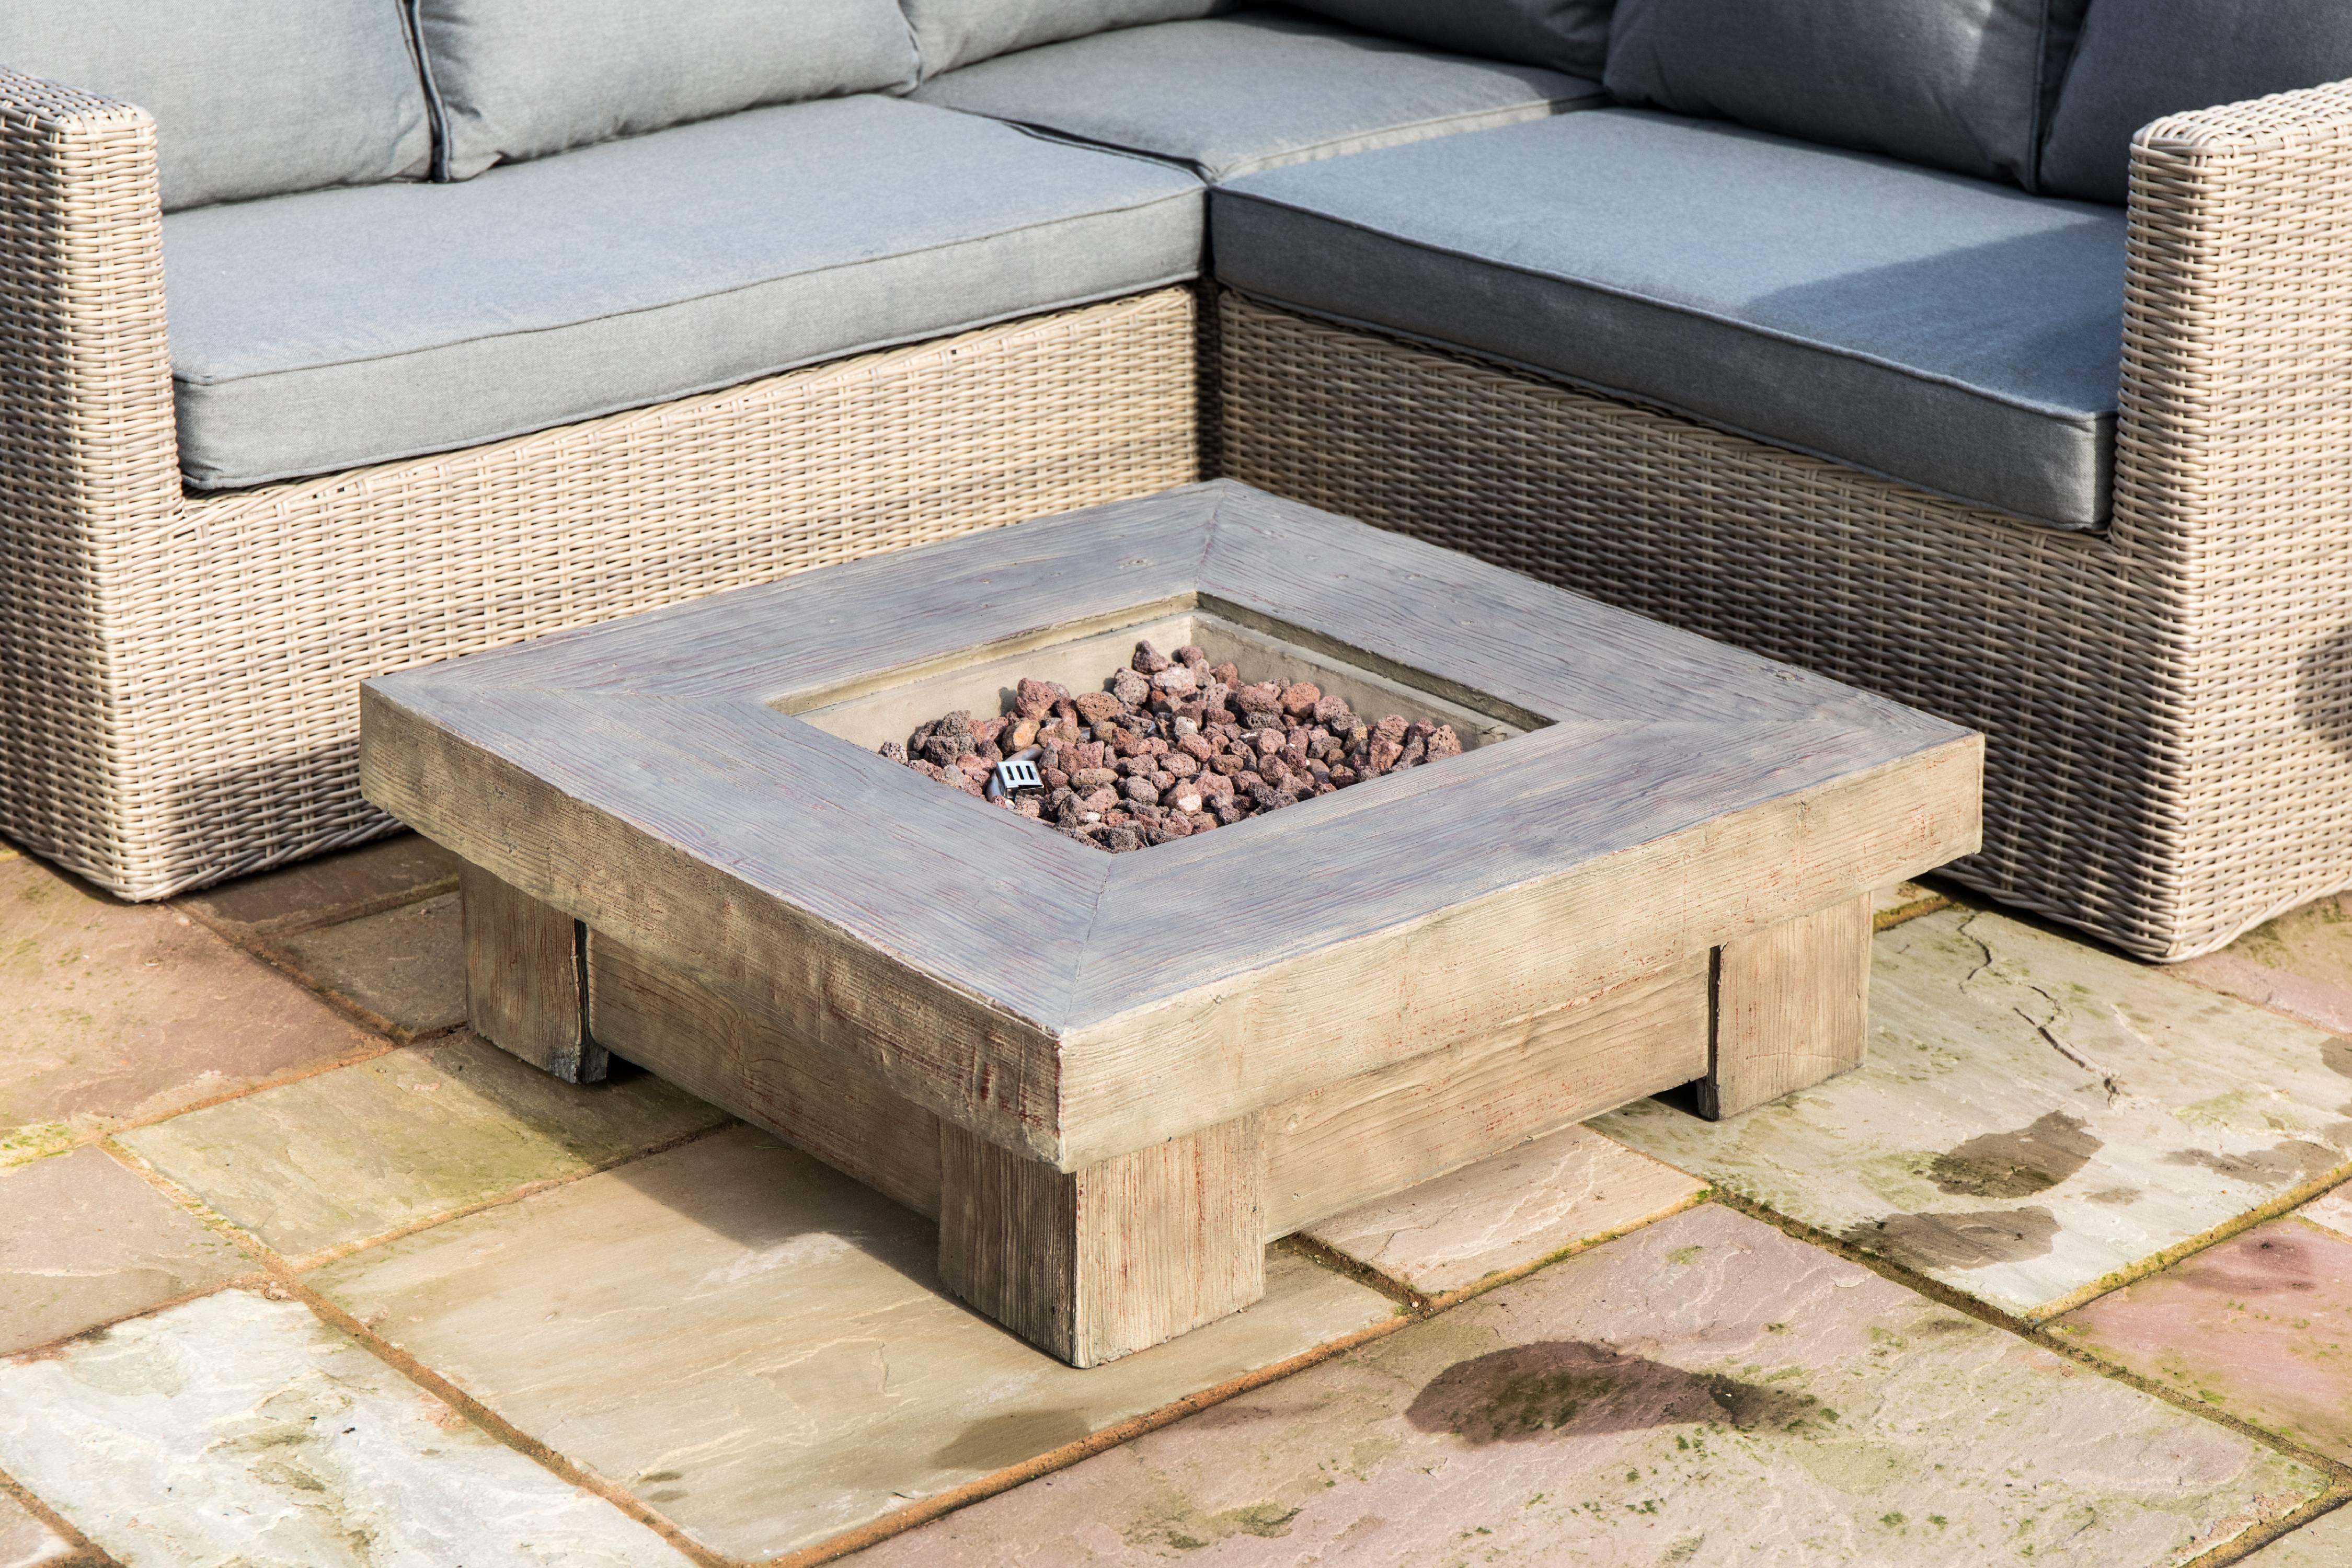 Awe Inspiring Peaktop Outdoor Retro Wood Look Square Propane Gas Fire Download Free Architecture Designs Rallybritishbridgeorg